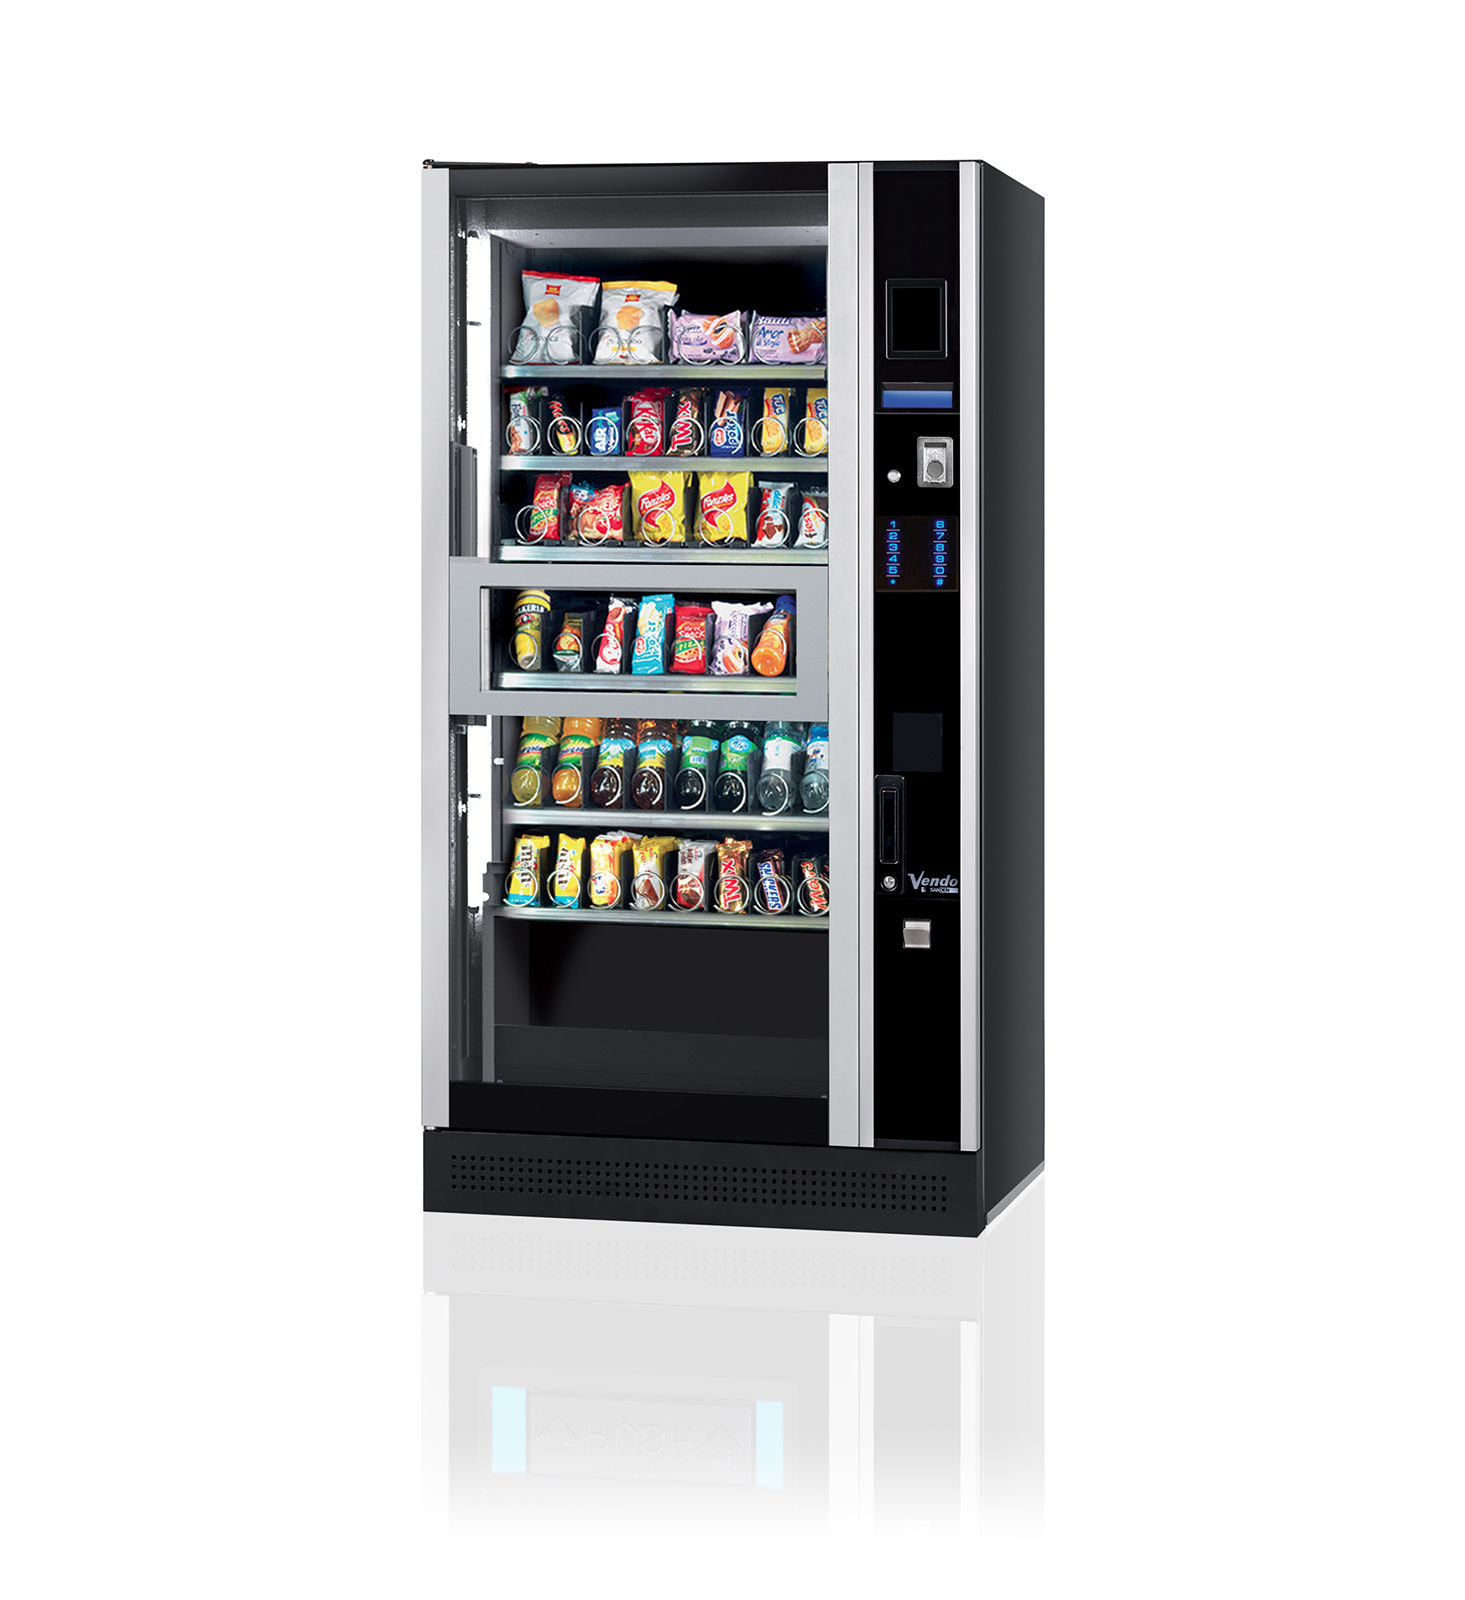 New York snack vending machine service provider